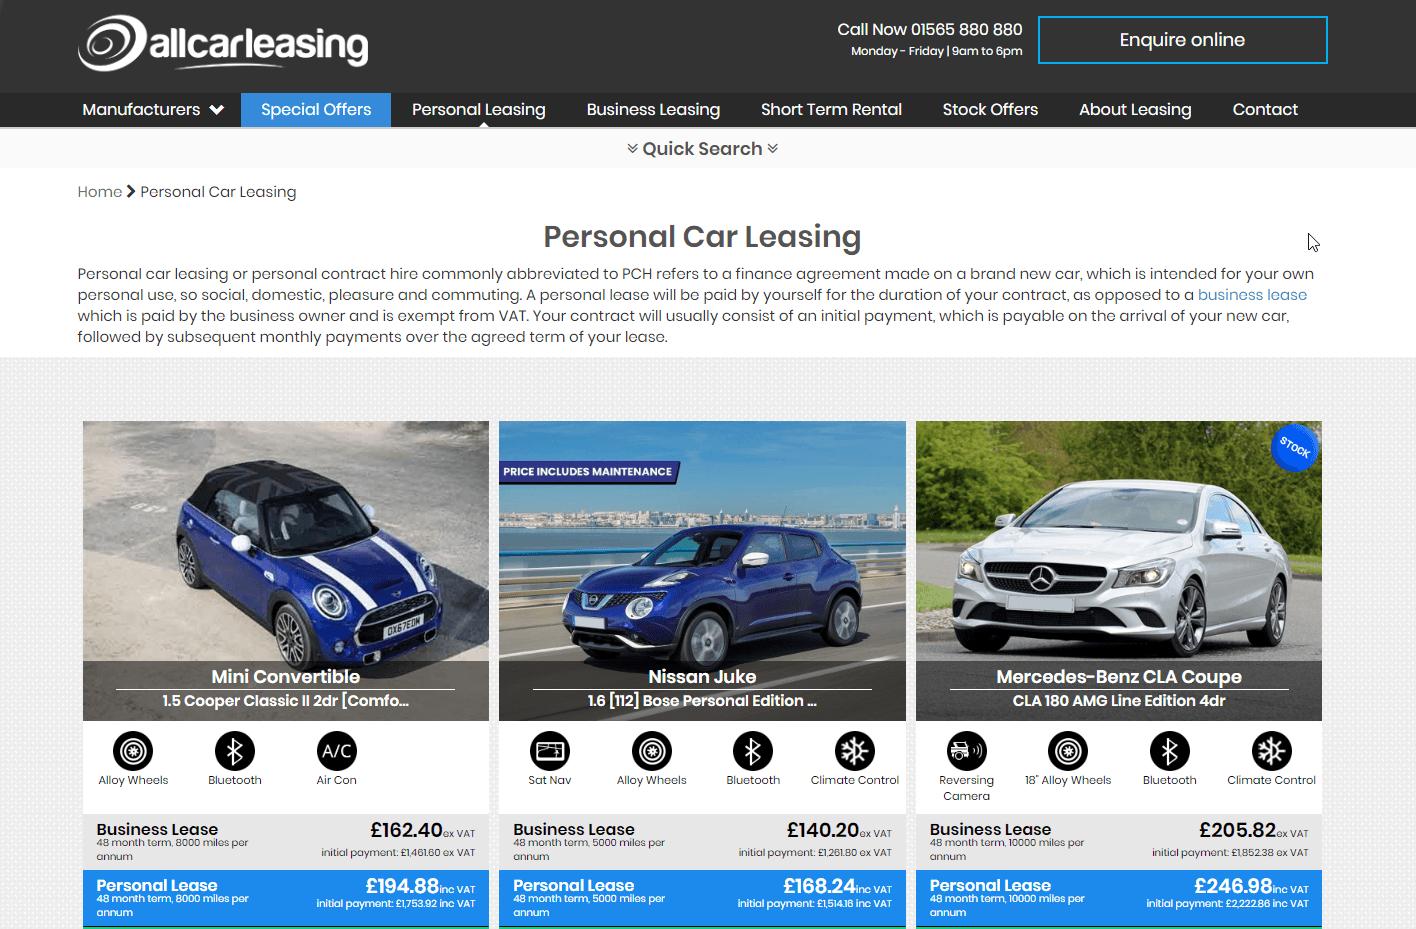 Allcarleasing.co.uk